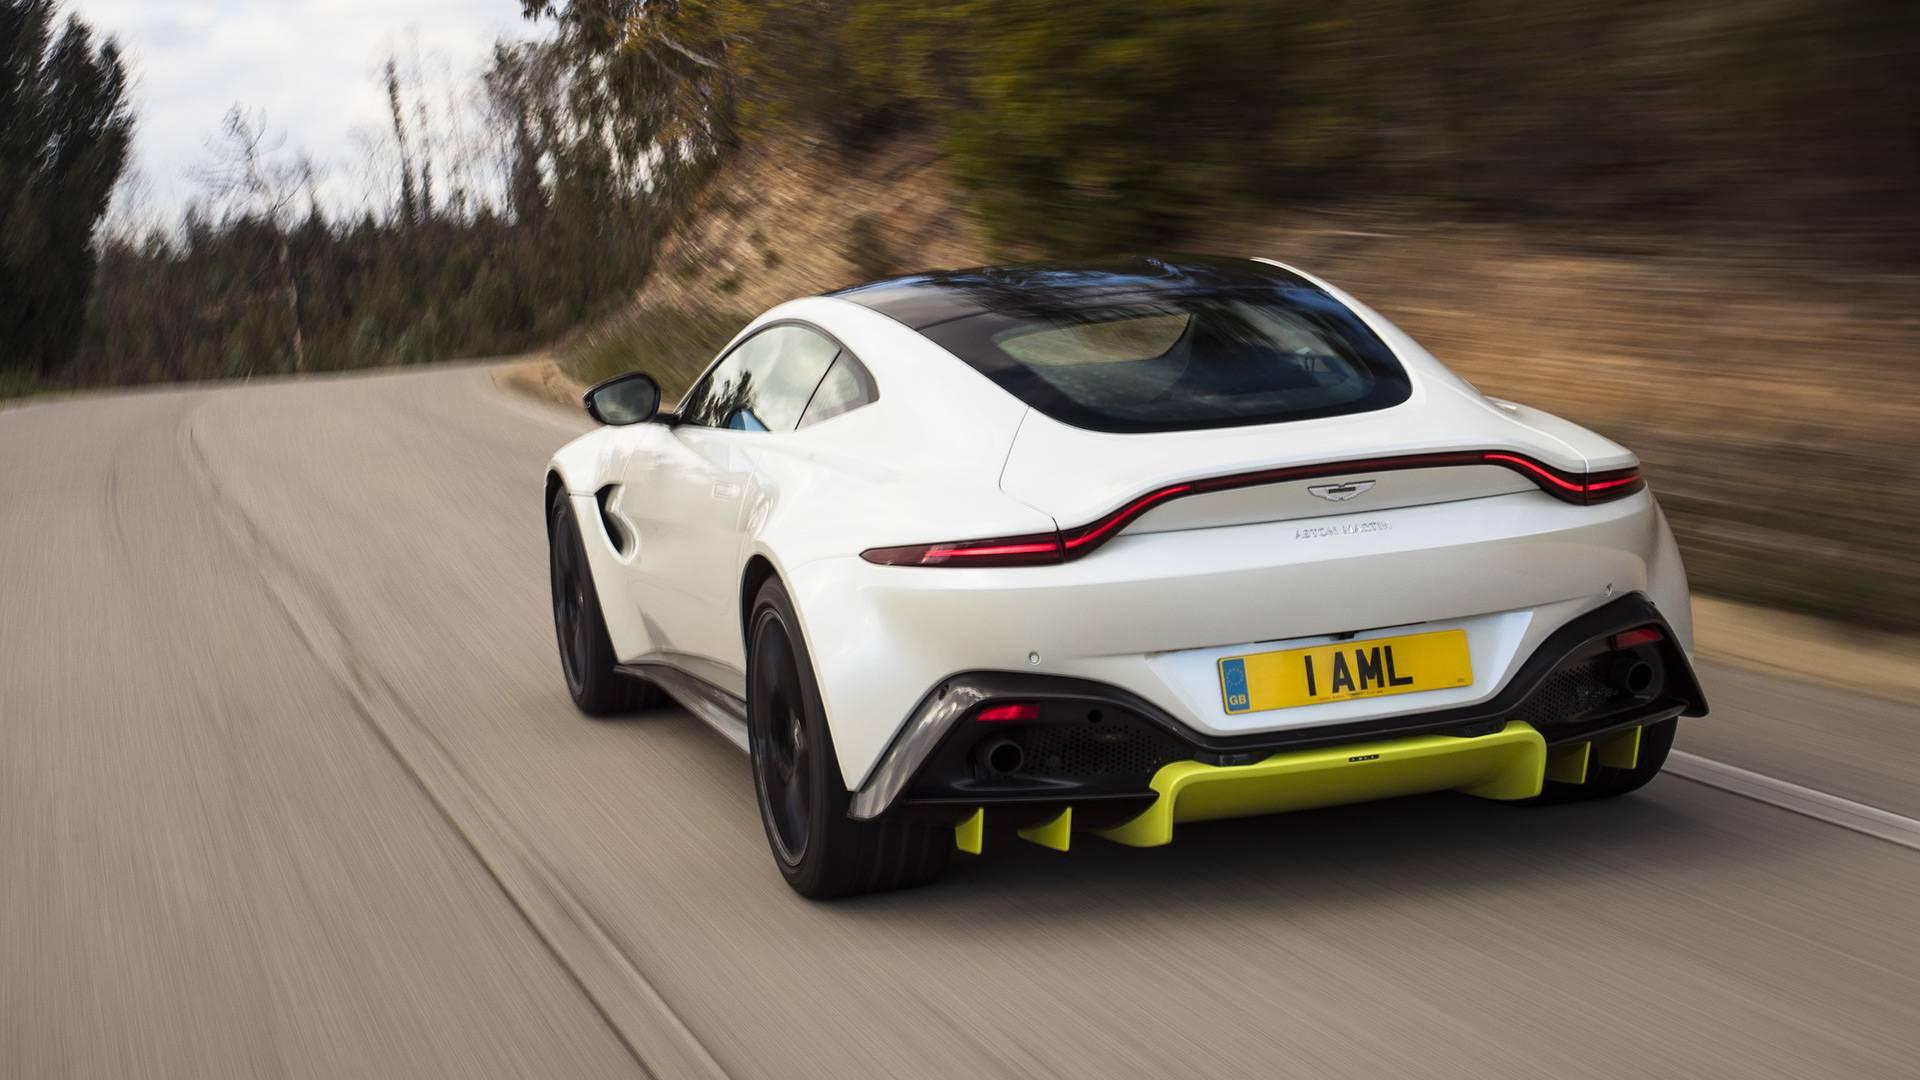 Aston Martin Vantage проходит трассу Нюрбургринг за 7:43